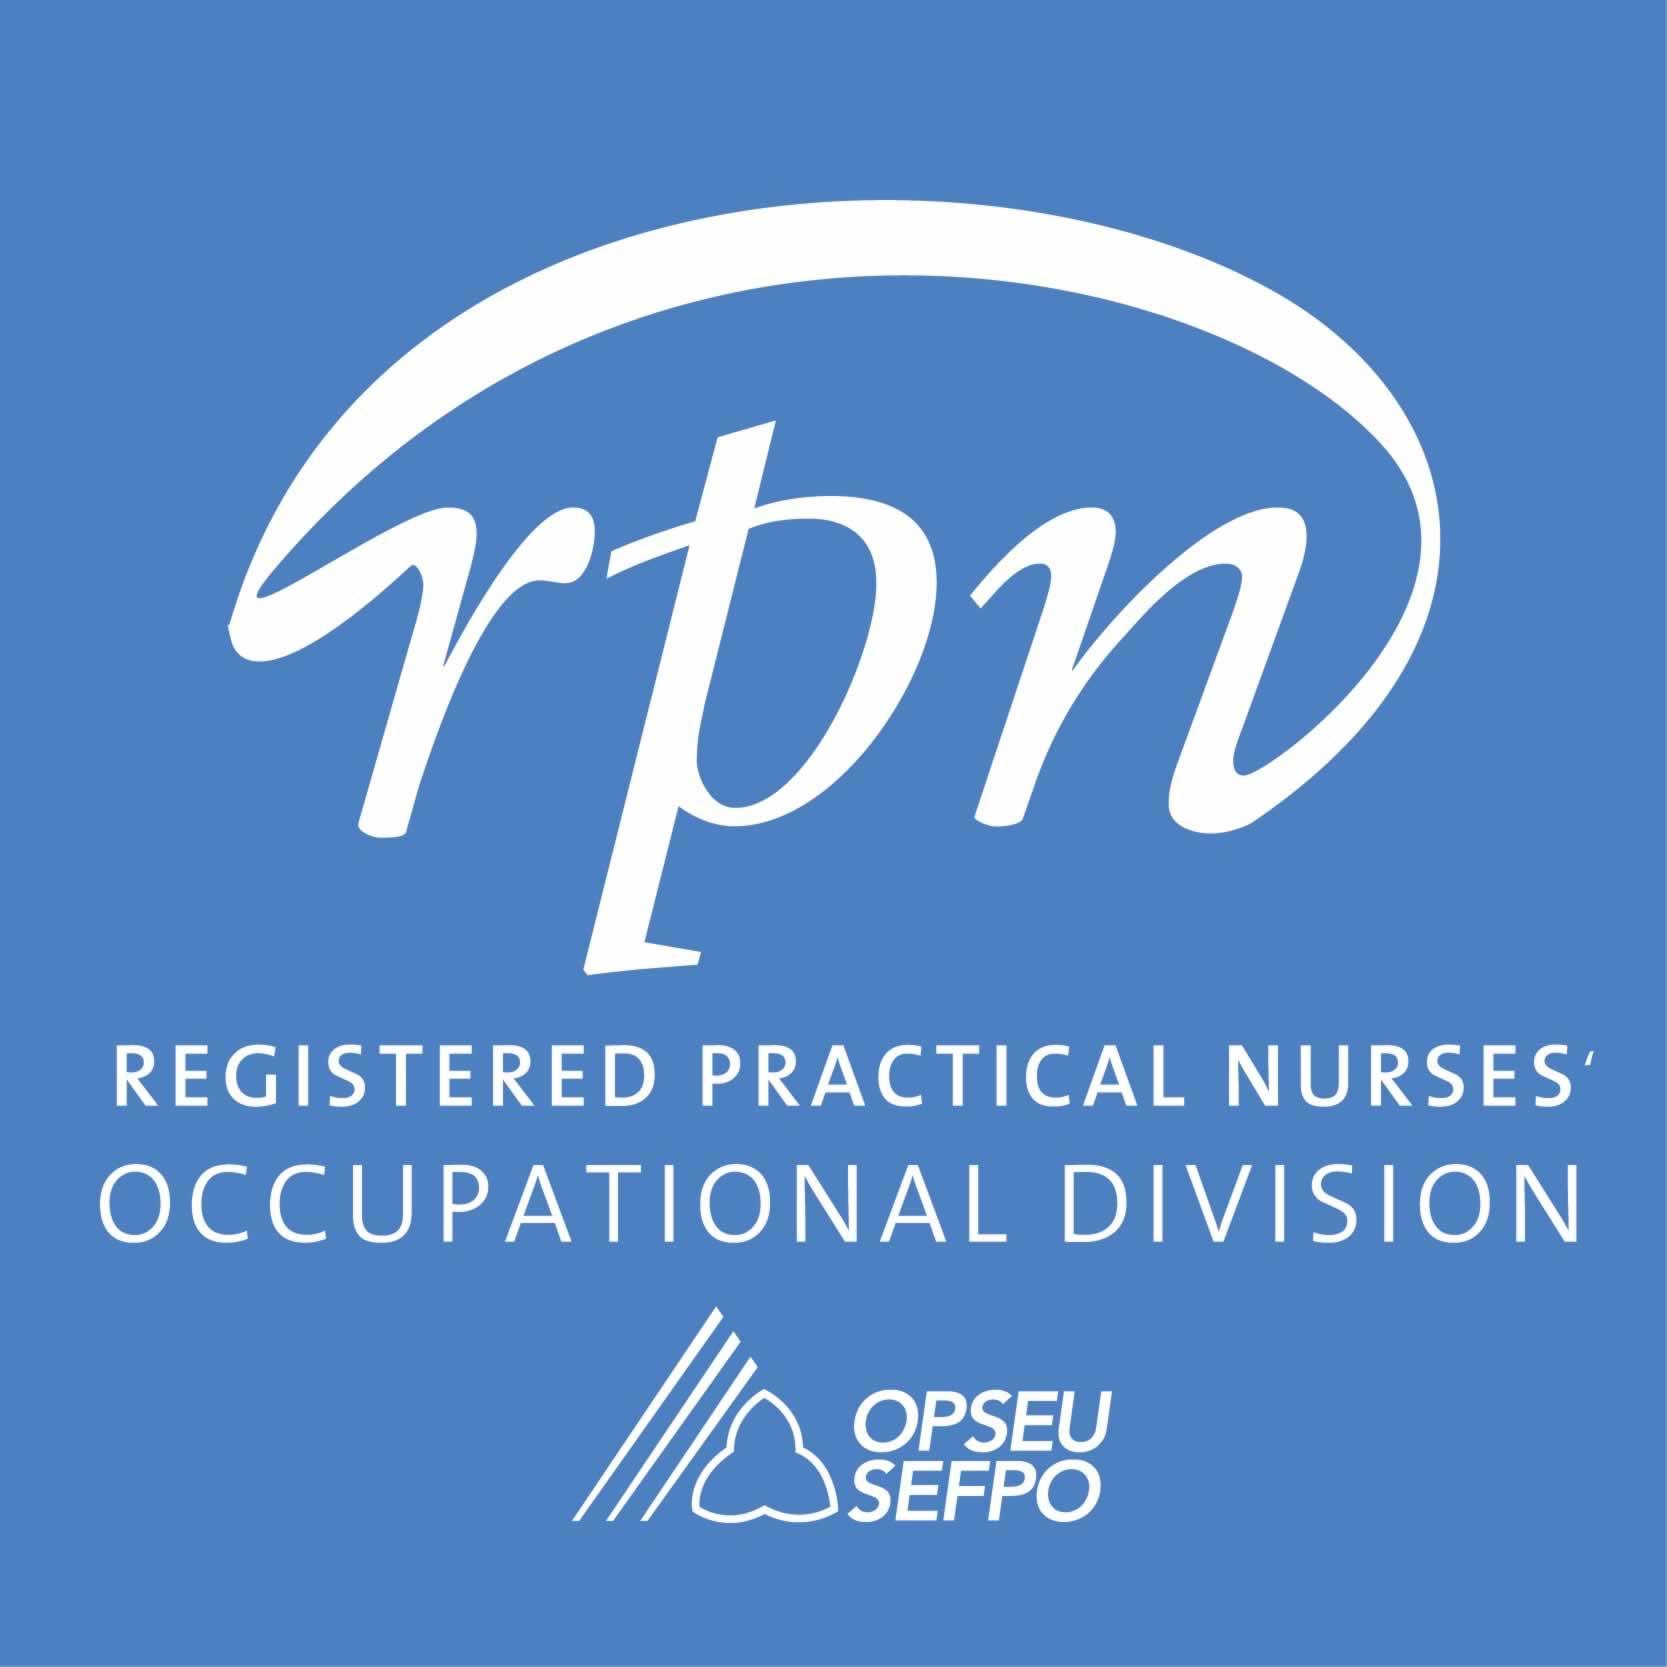 Registered Practical Nurses Occupational Division OPSEU SEFPO